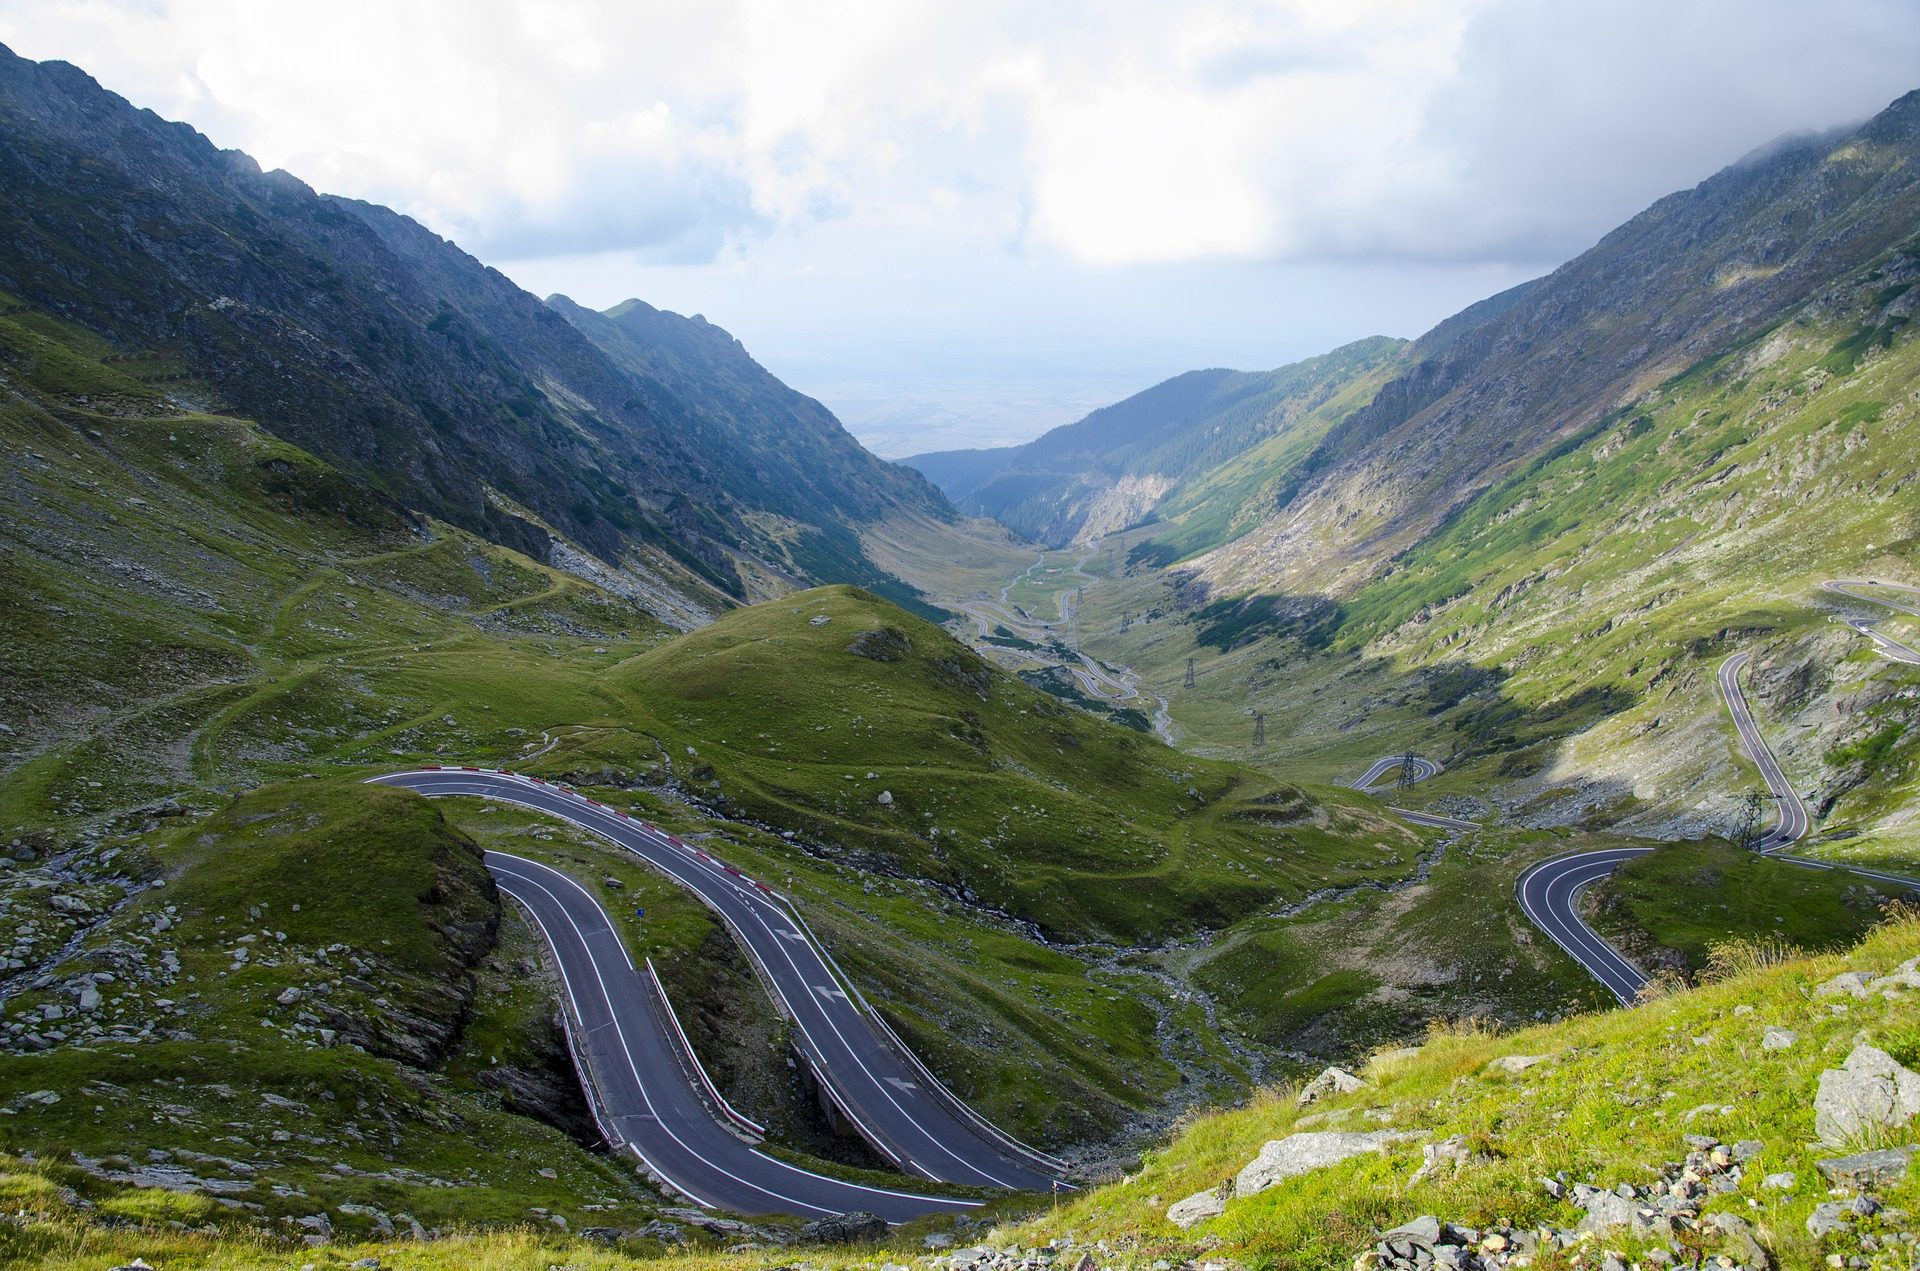 montagne, carretera, curve, Viaggi, viaggio, cStrada- Sfondi HD - Professor-falken.com